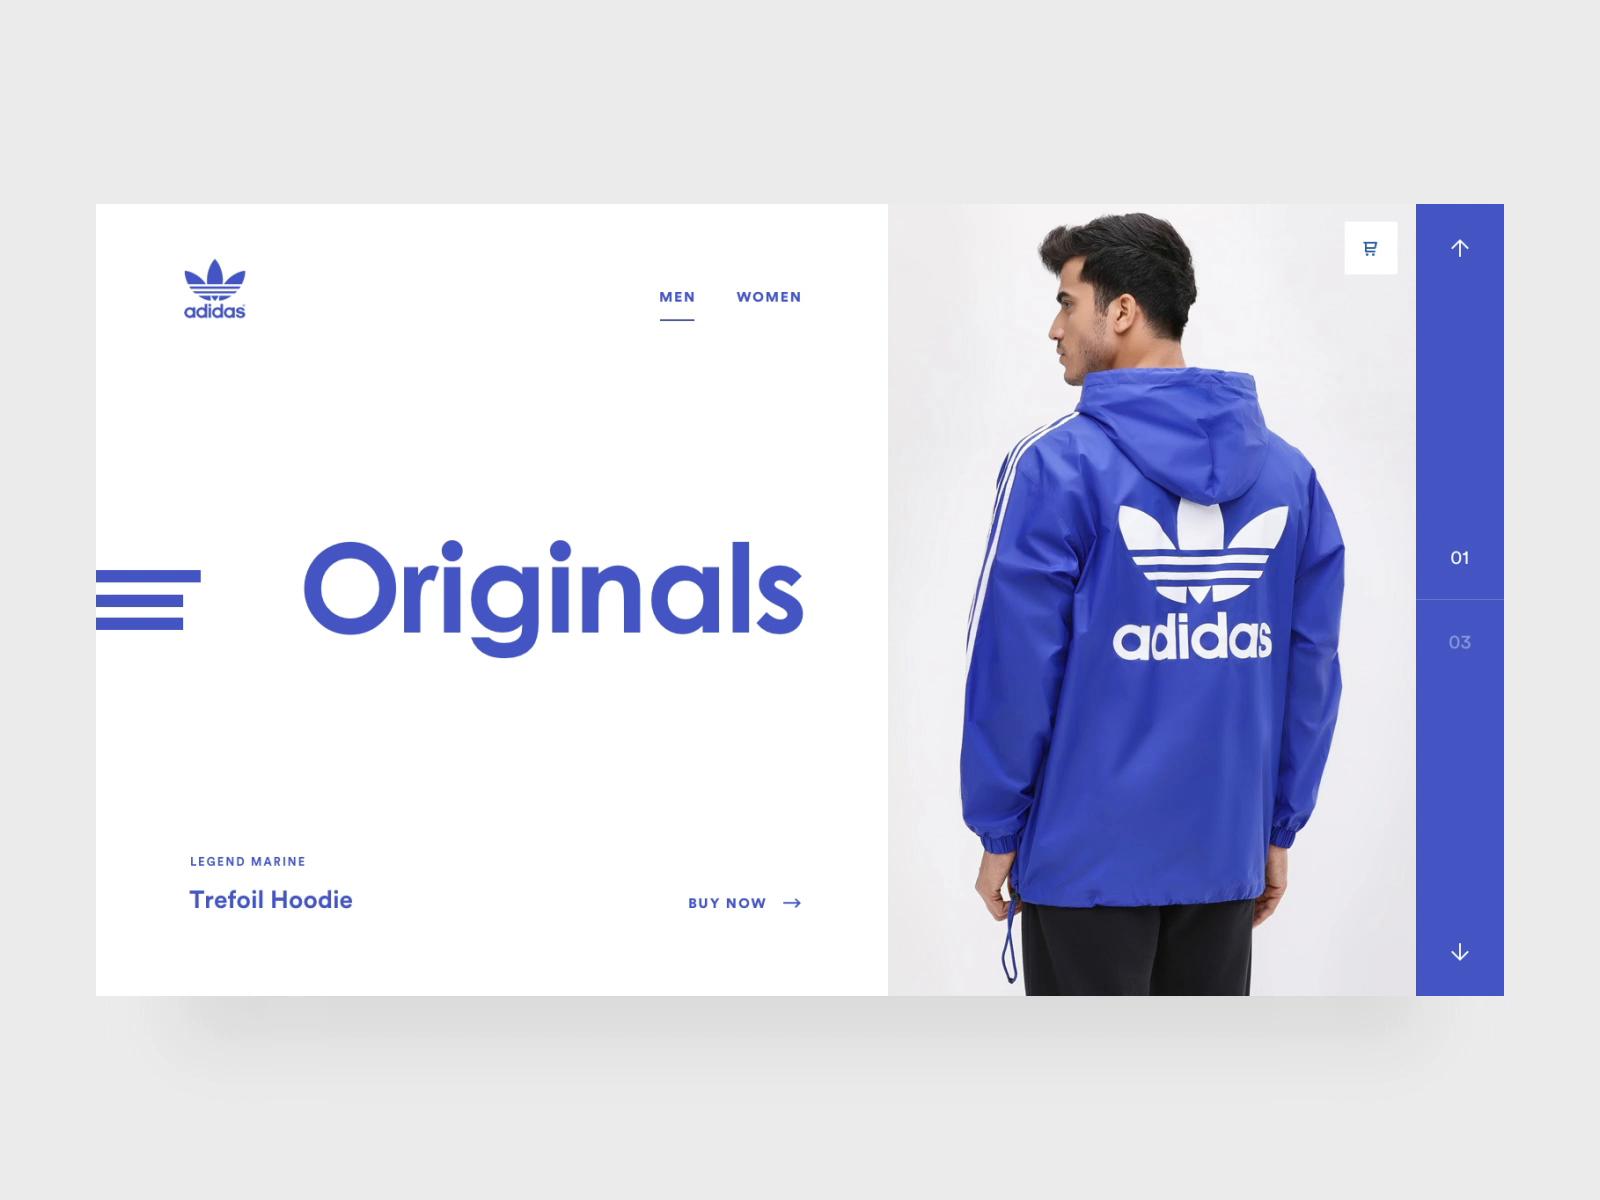 Adidas Originals by Jonathan Vuijk